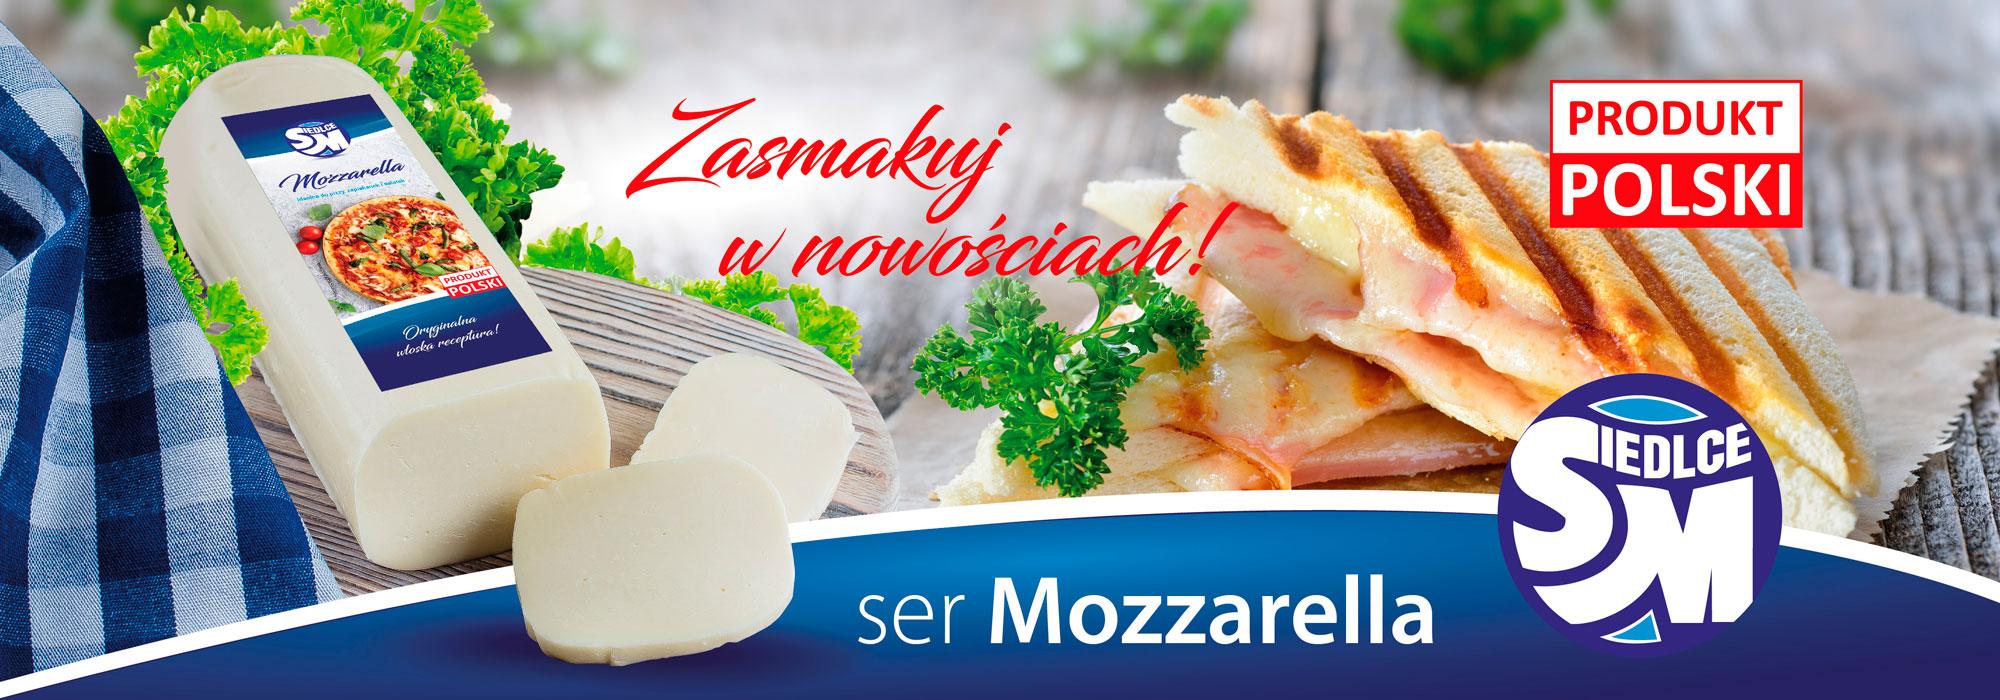 osm-mozzarela-01